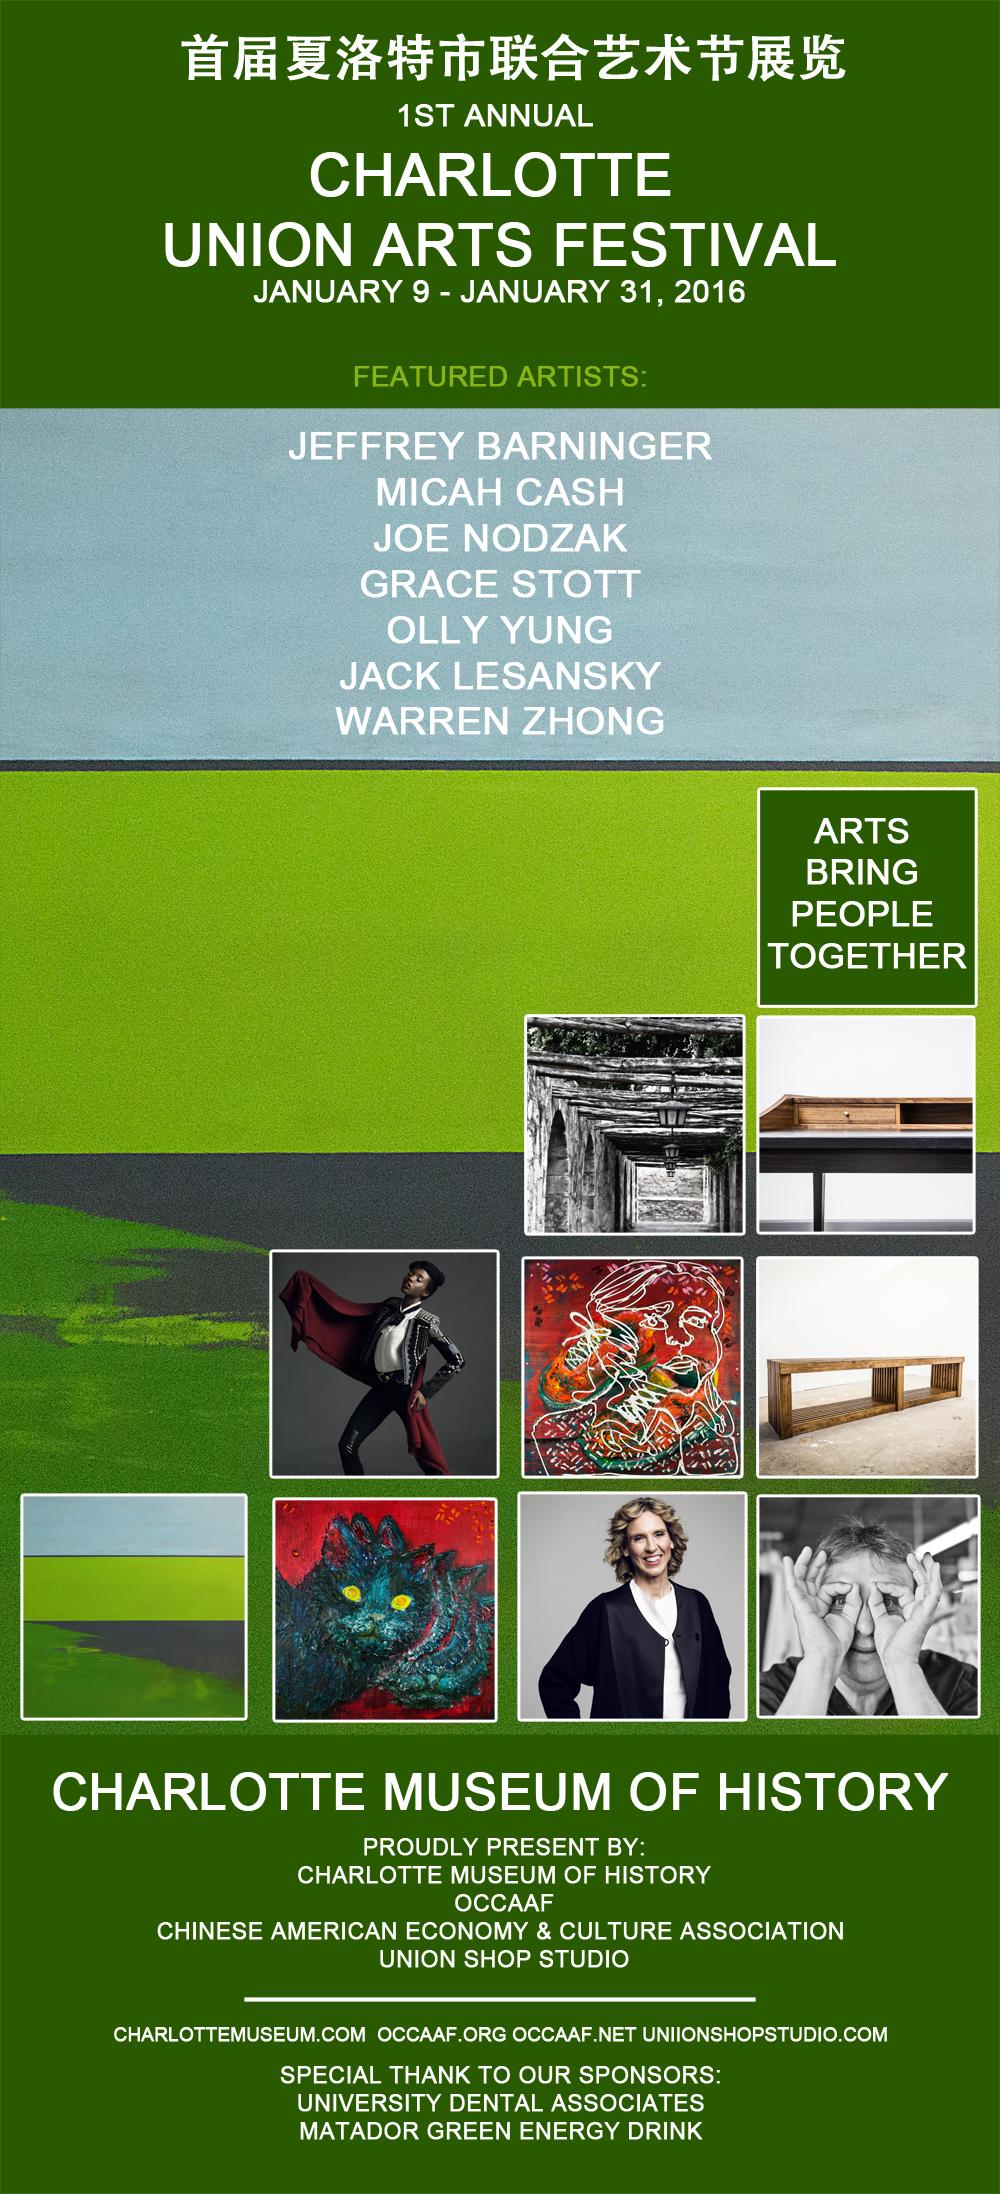 union arts festival poster-1200.2.0